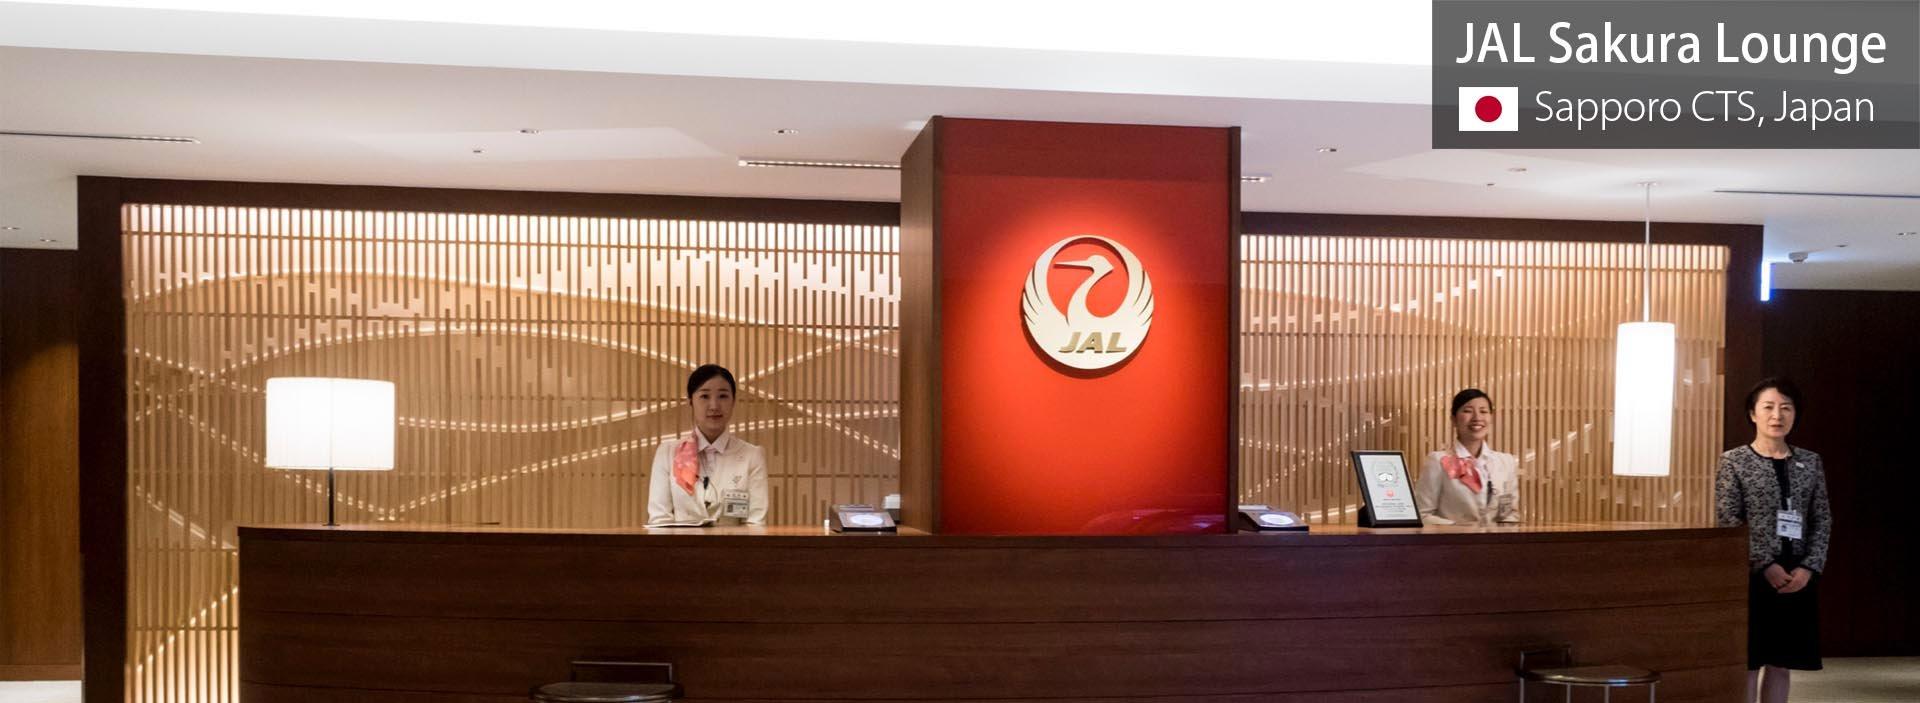 Review: JAL Sakura Lounge at Sapporo New Chitose